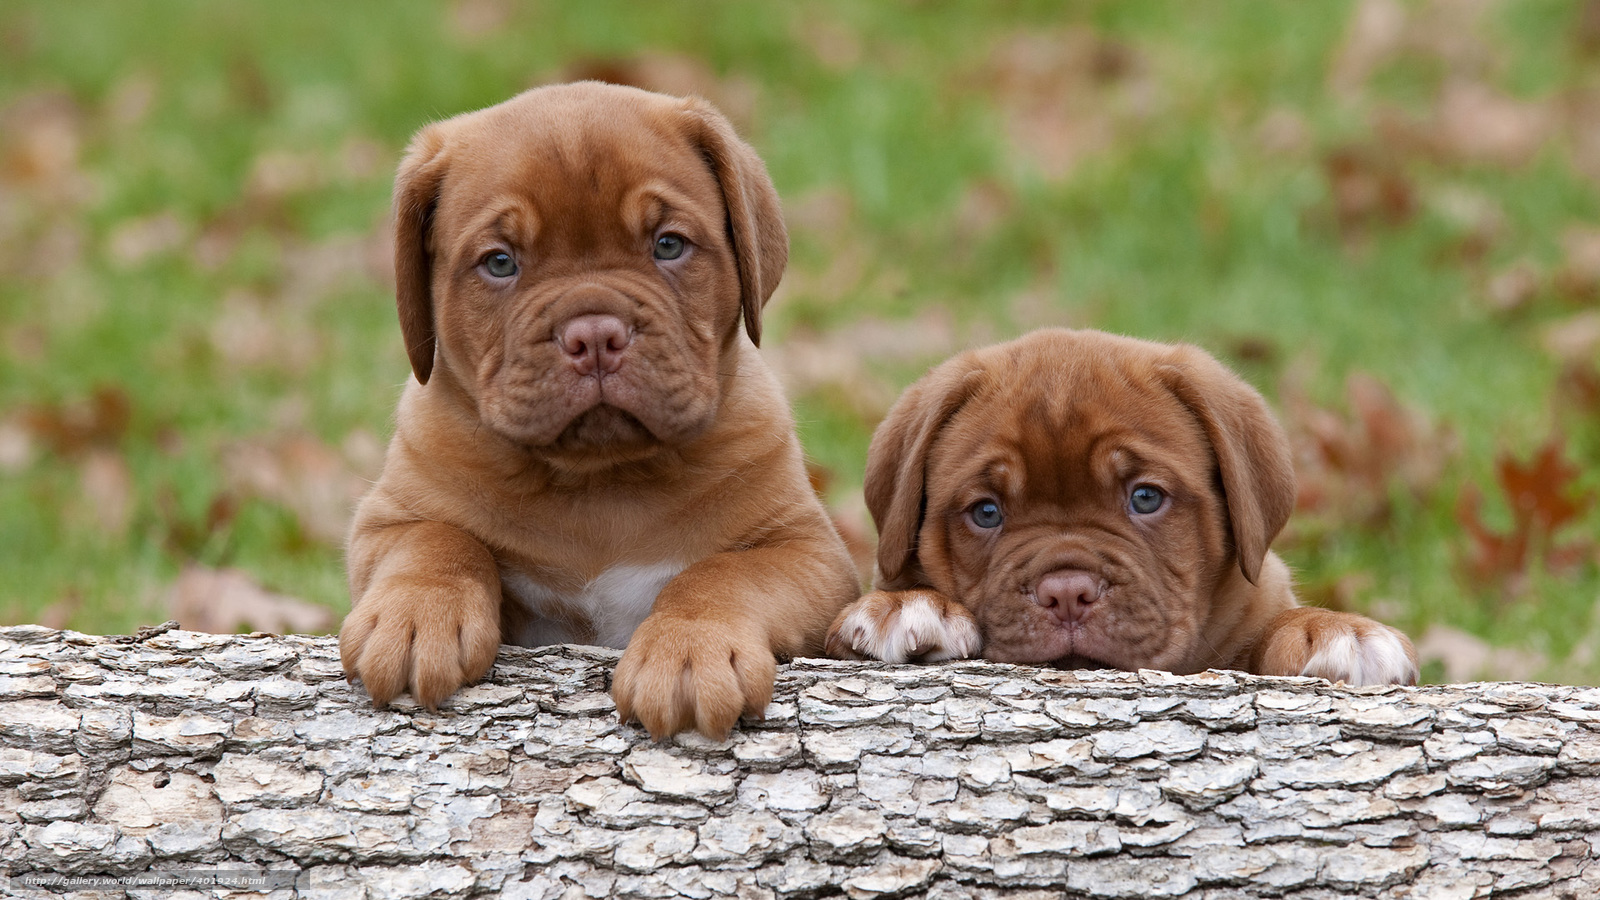 Tlcharger fond d 39 ecran dogue de bordeaux chiots chiens les tout petits - Les petits hauts bordeaux ...